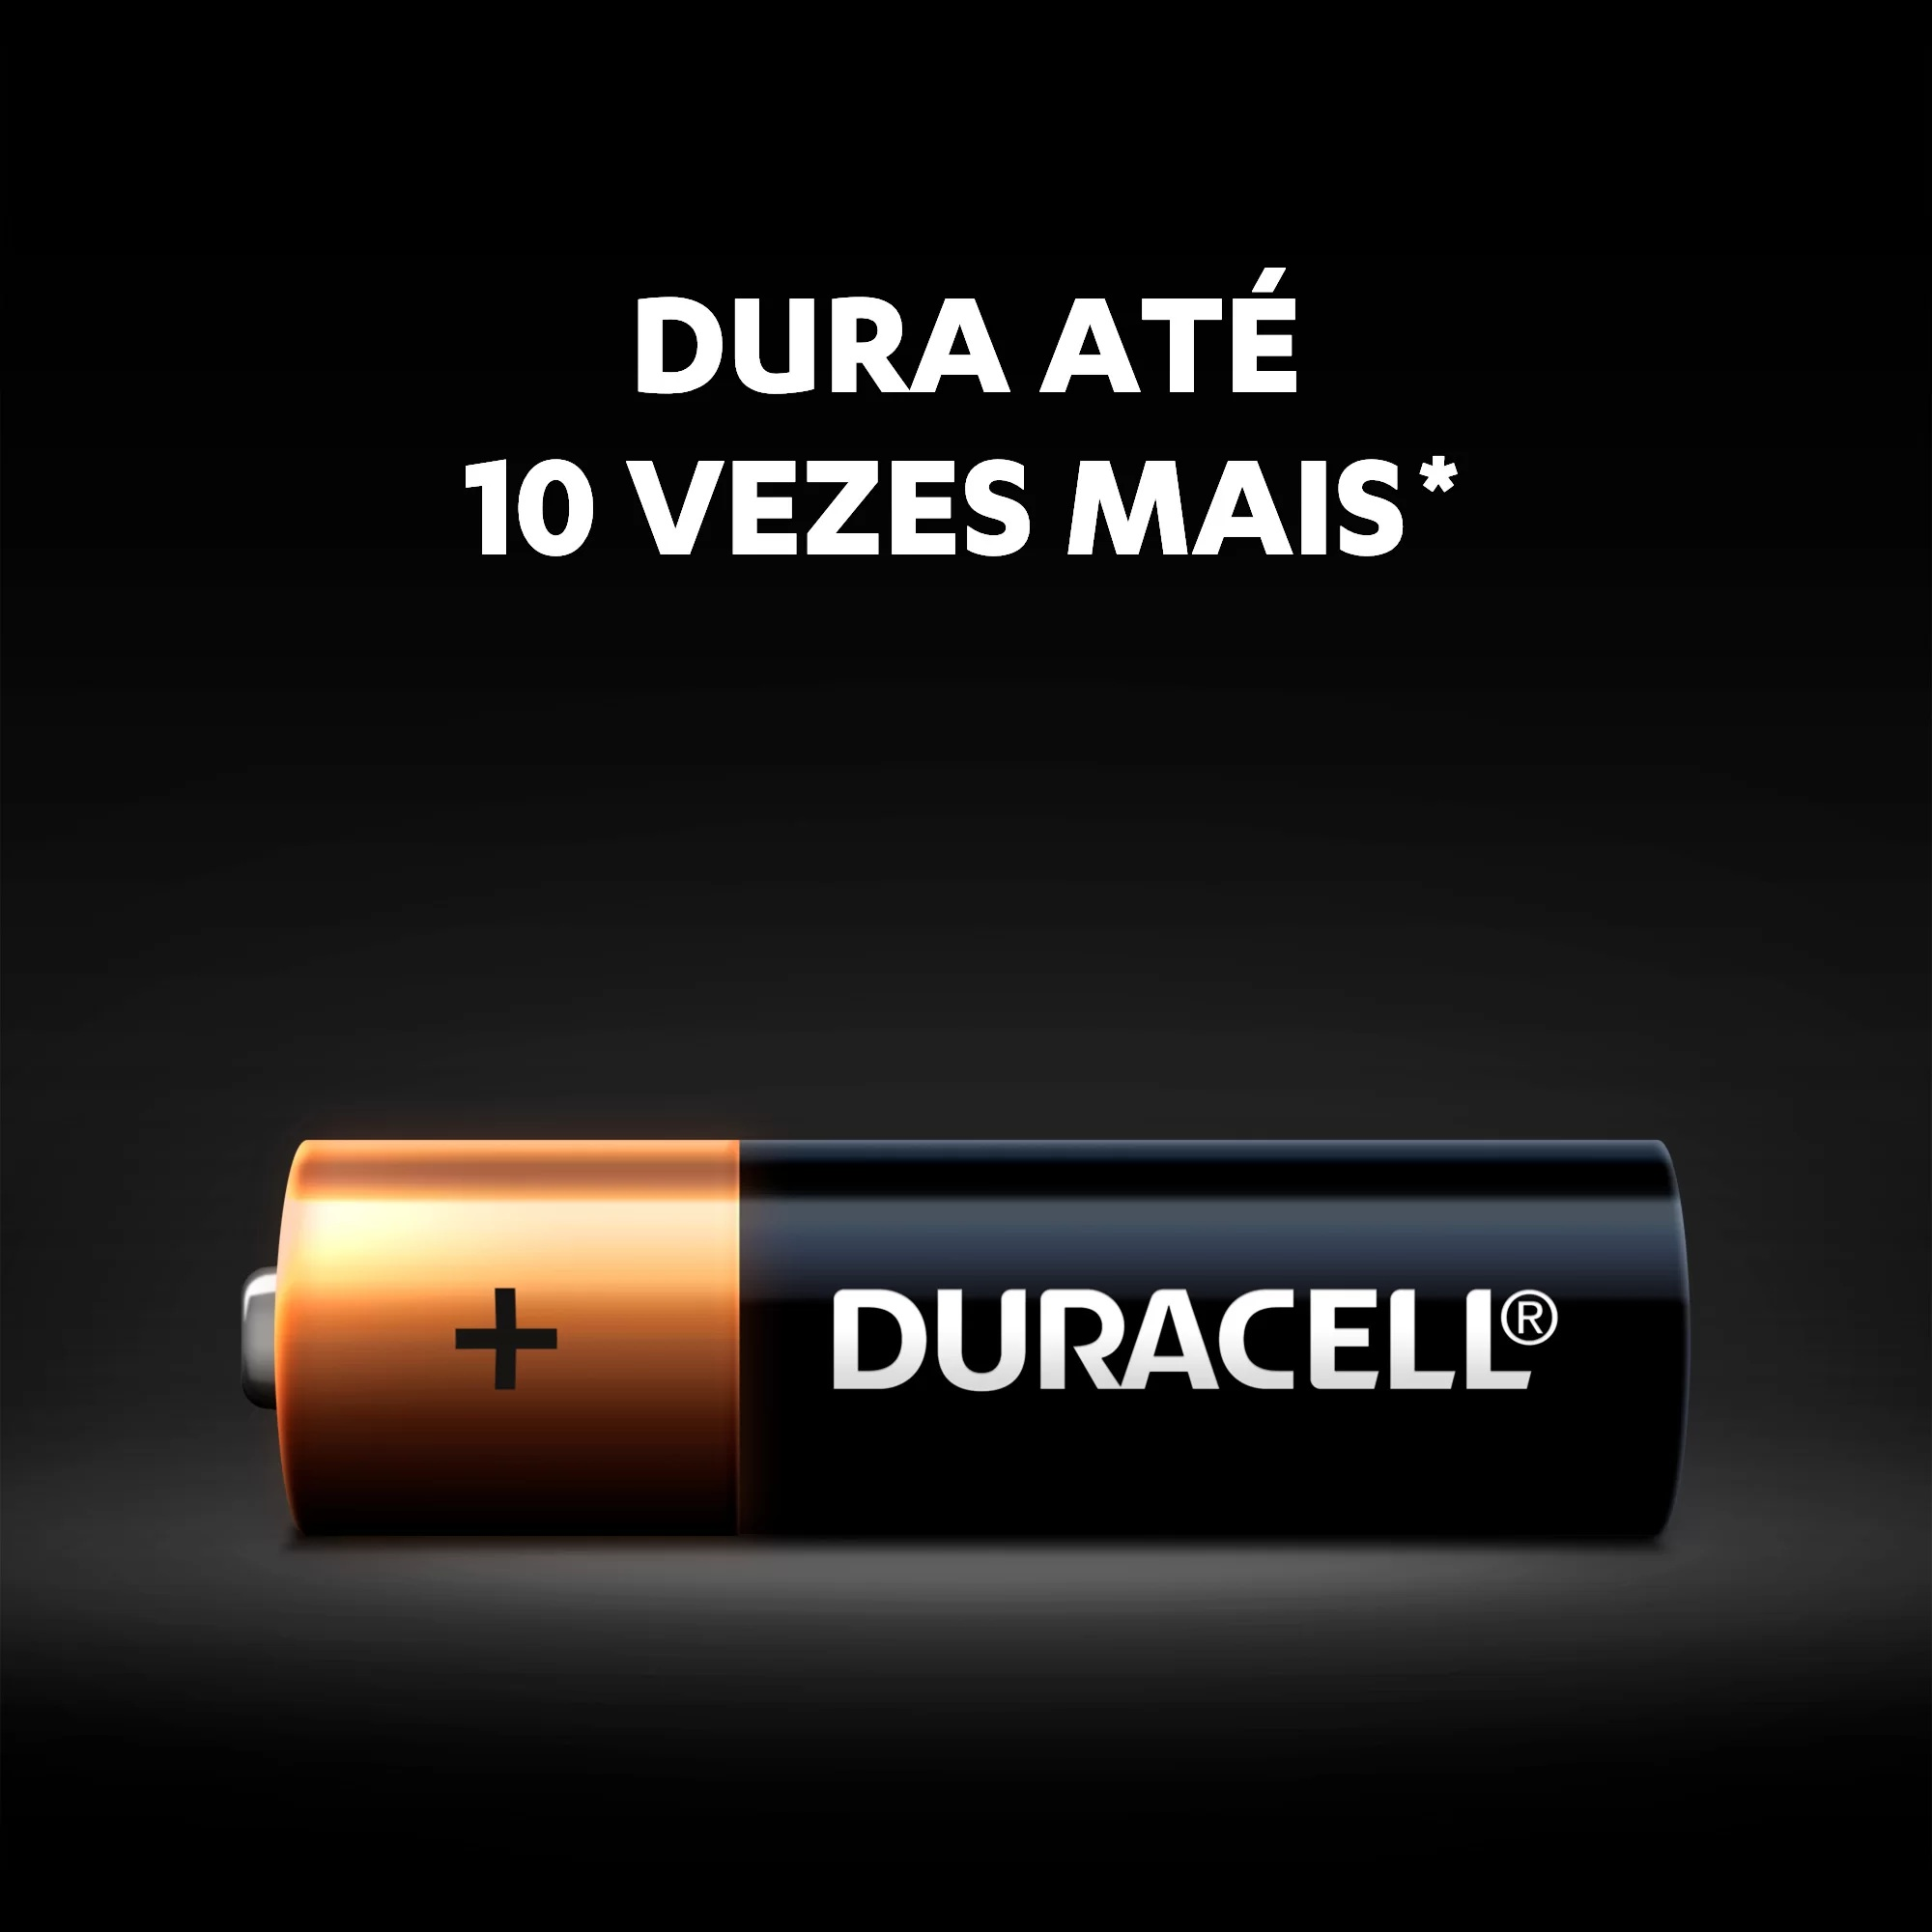 Pilha Duracell Alcalina Palito Aaa Econopack C/16 Unidades